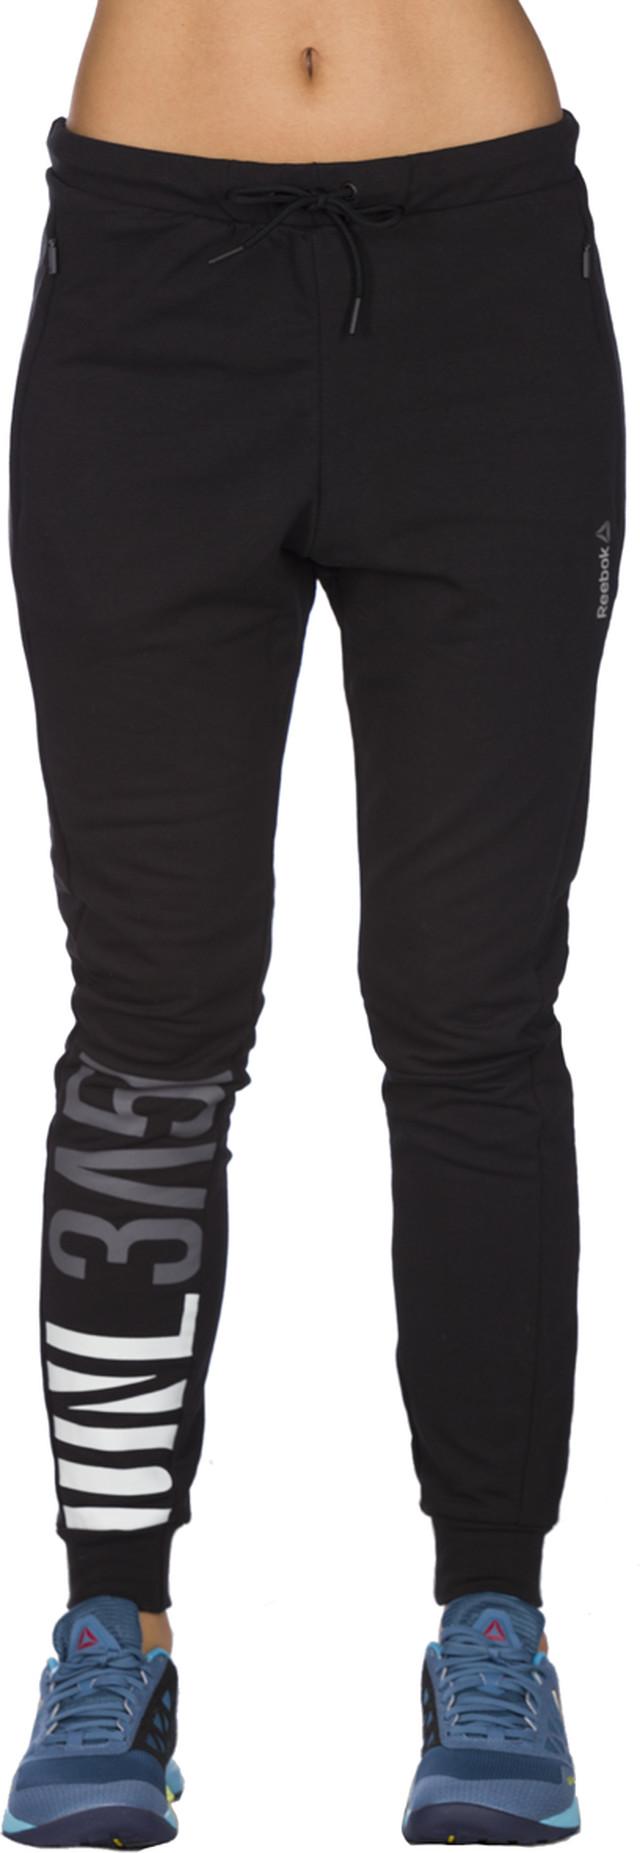 Reebok WOR CS Cotton Pant Black 882 AY1882